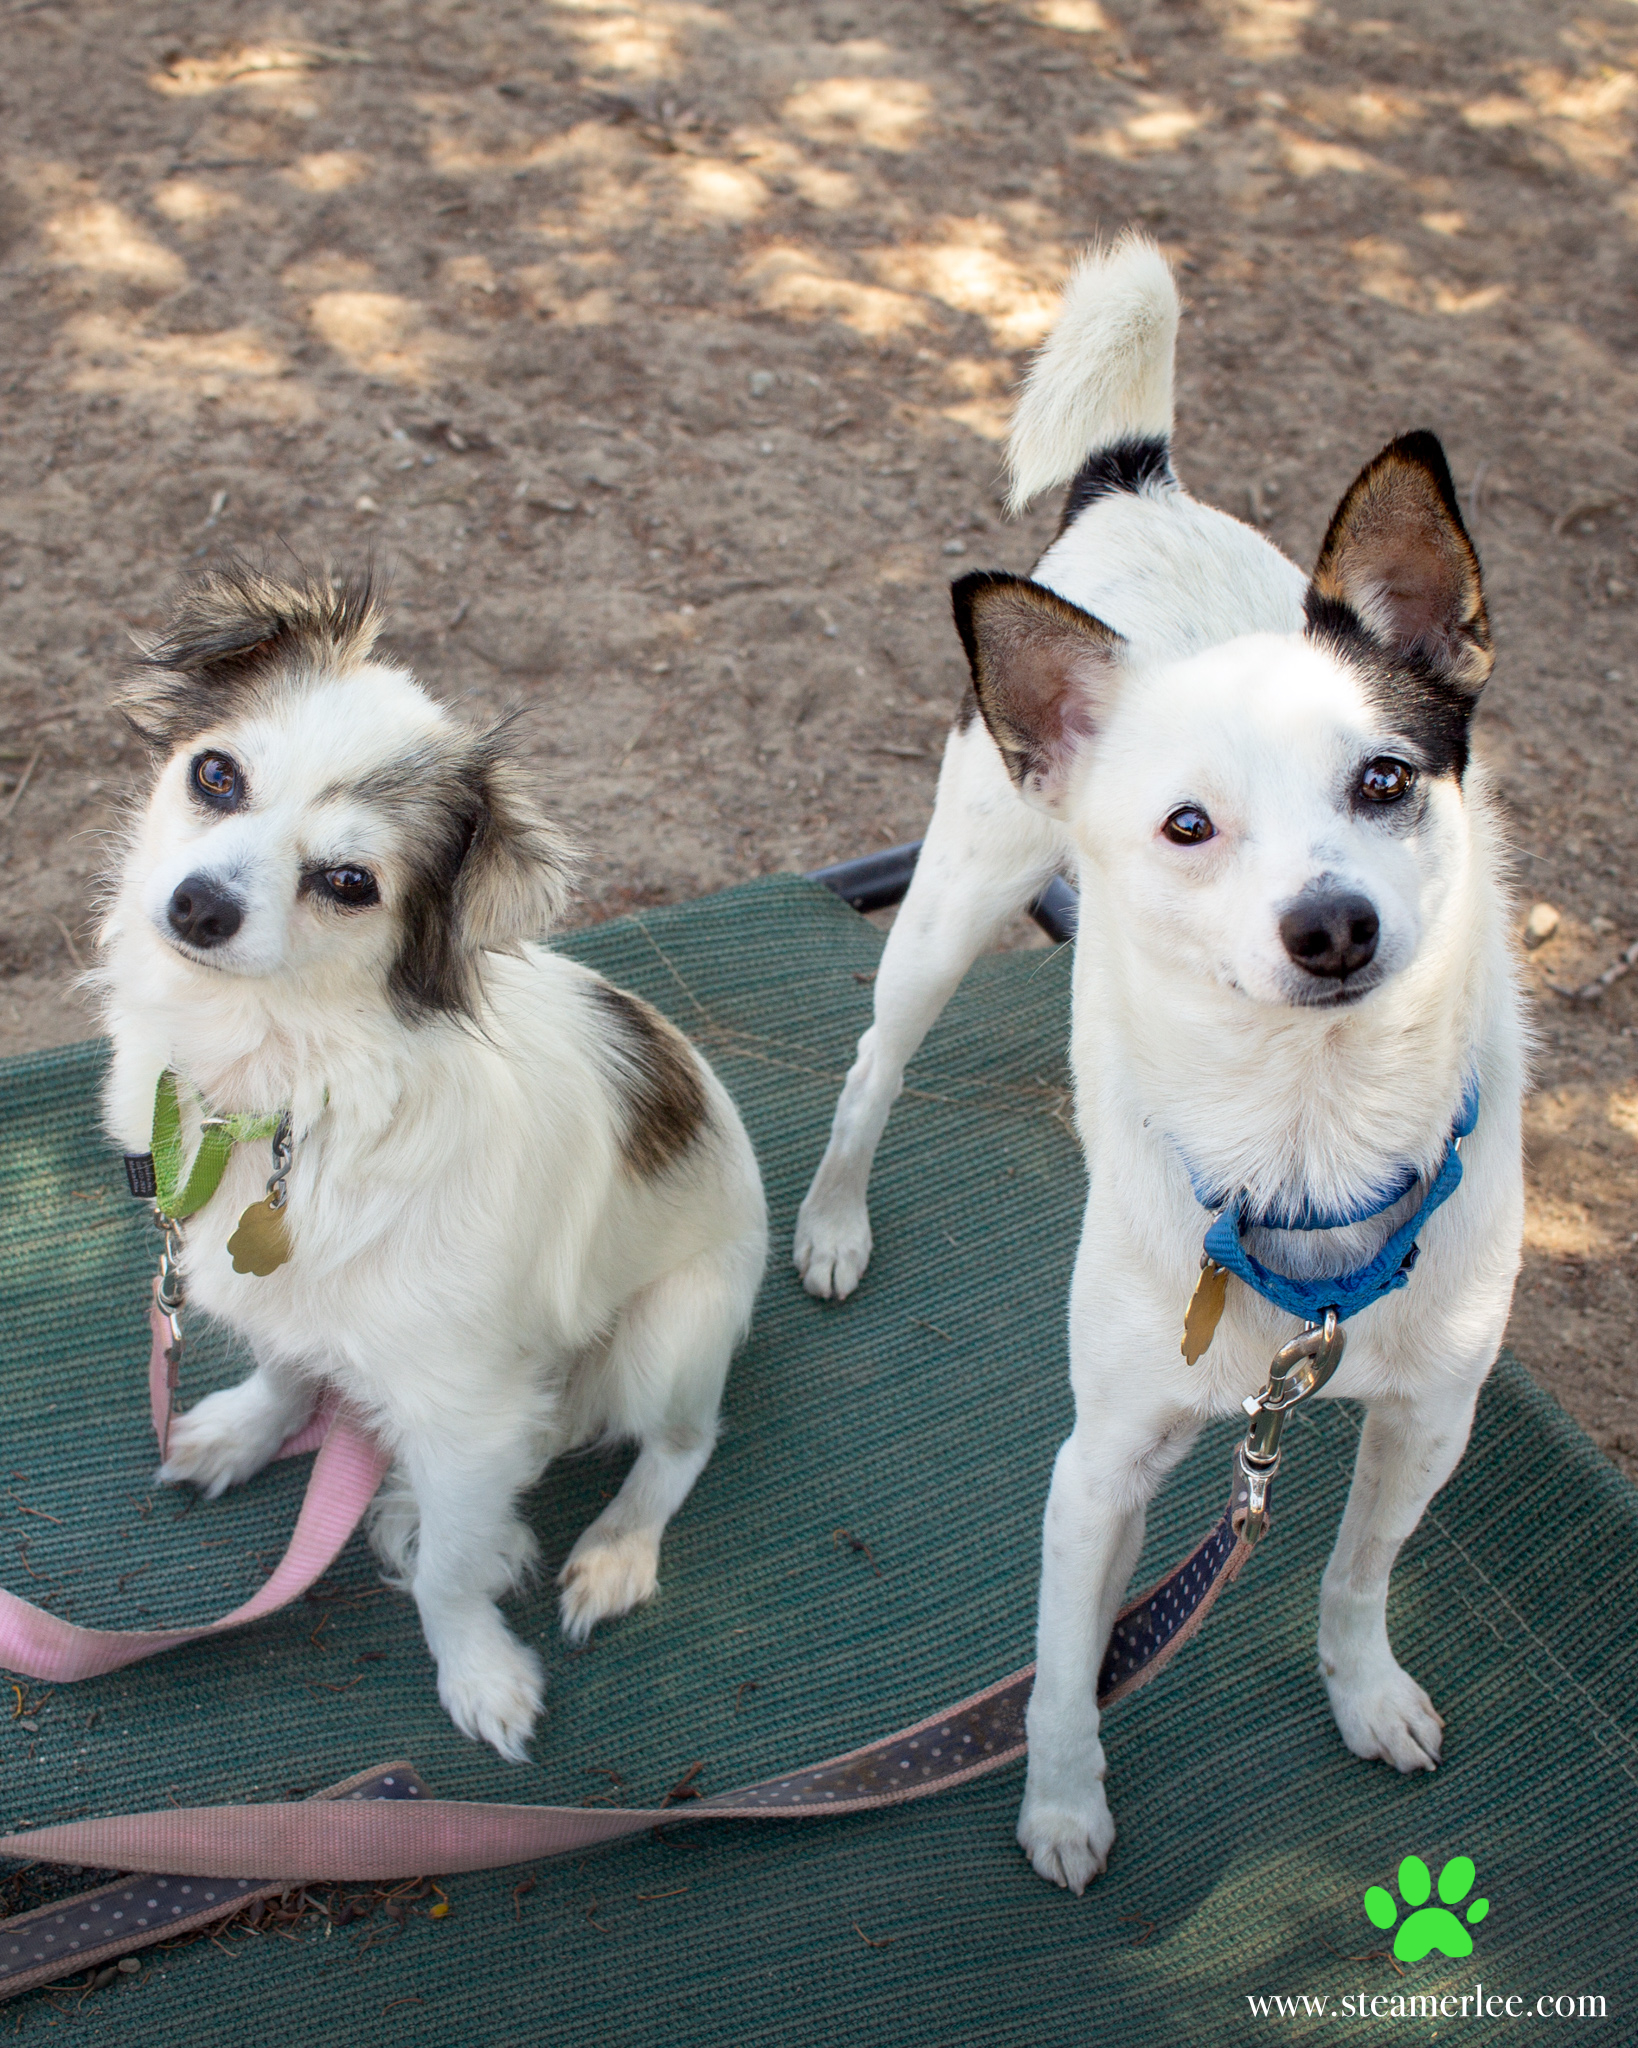 482-Orange-County-Dog-Photography-Steamer-Lee-Southern-California-SBACC.JPG